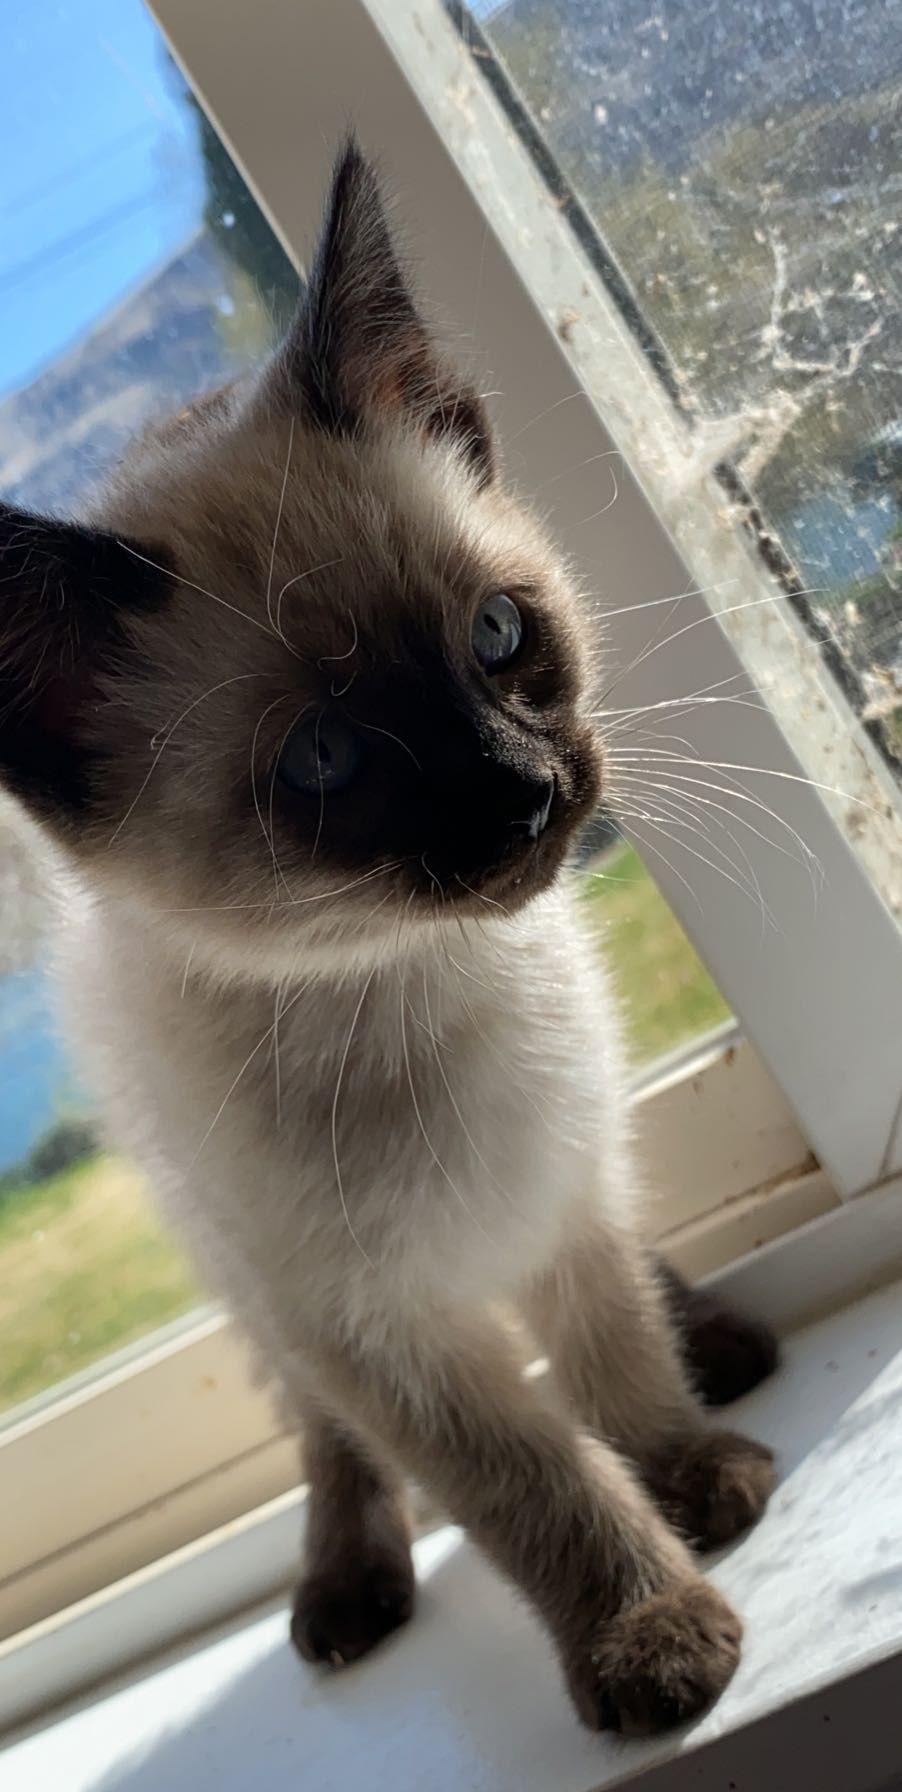 Http Www Animalwallpaper Org Wp Content Uploads 2011 02 Cats 1024 C3 97 768 Scottish Fold Jpg Baby Cats Cute Baby Cats Scottish Fold Kittens